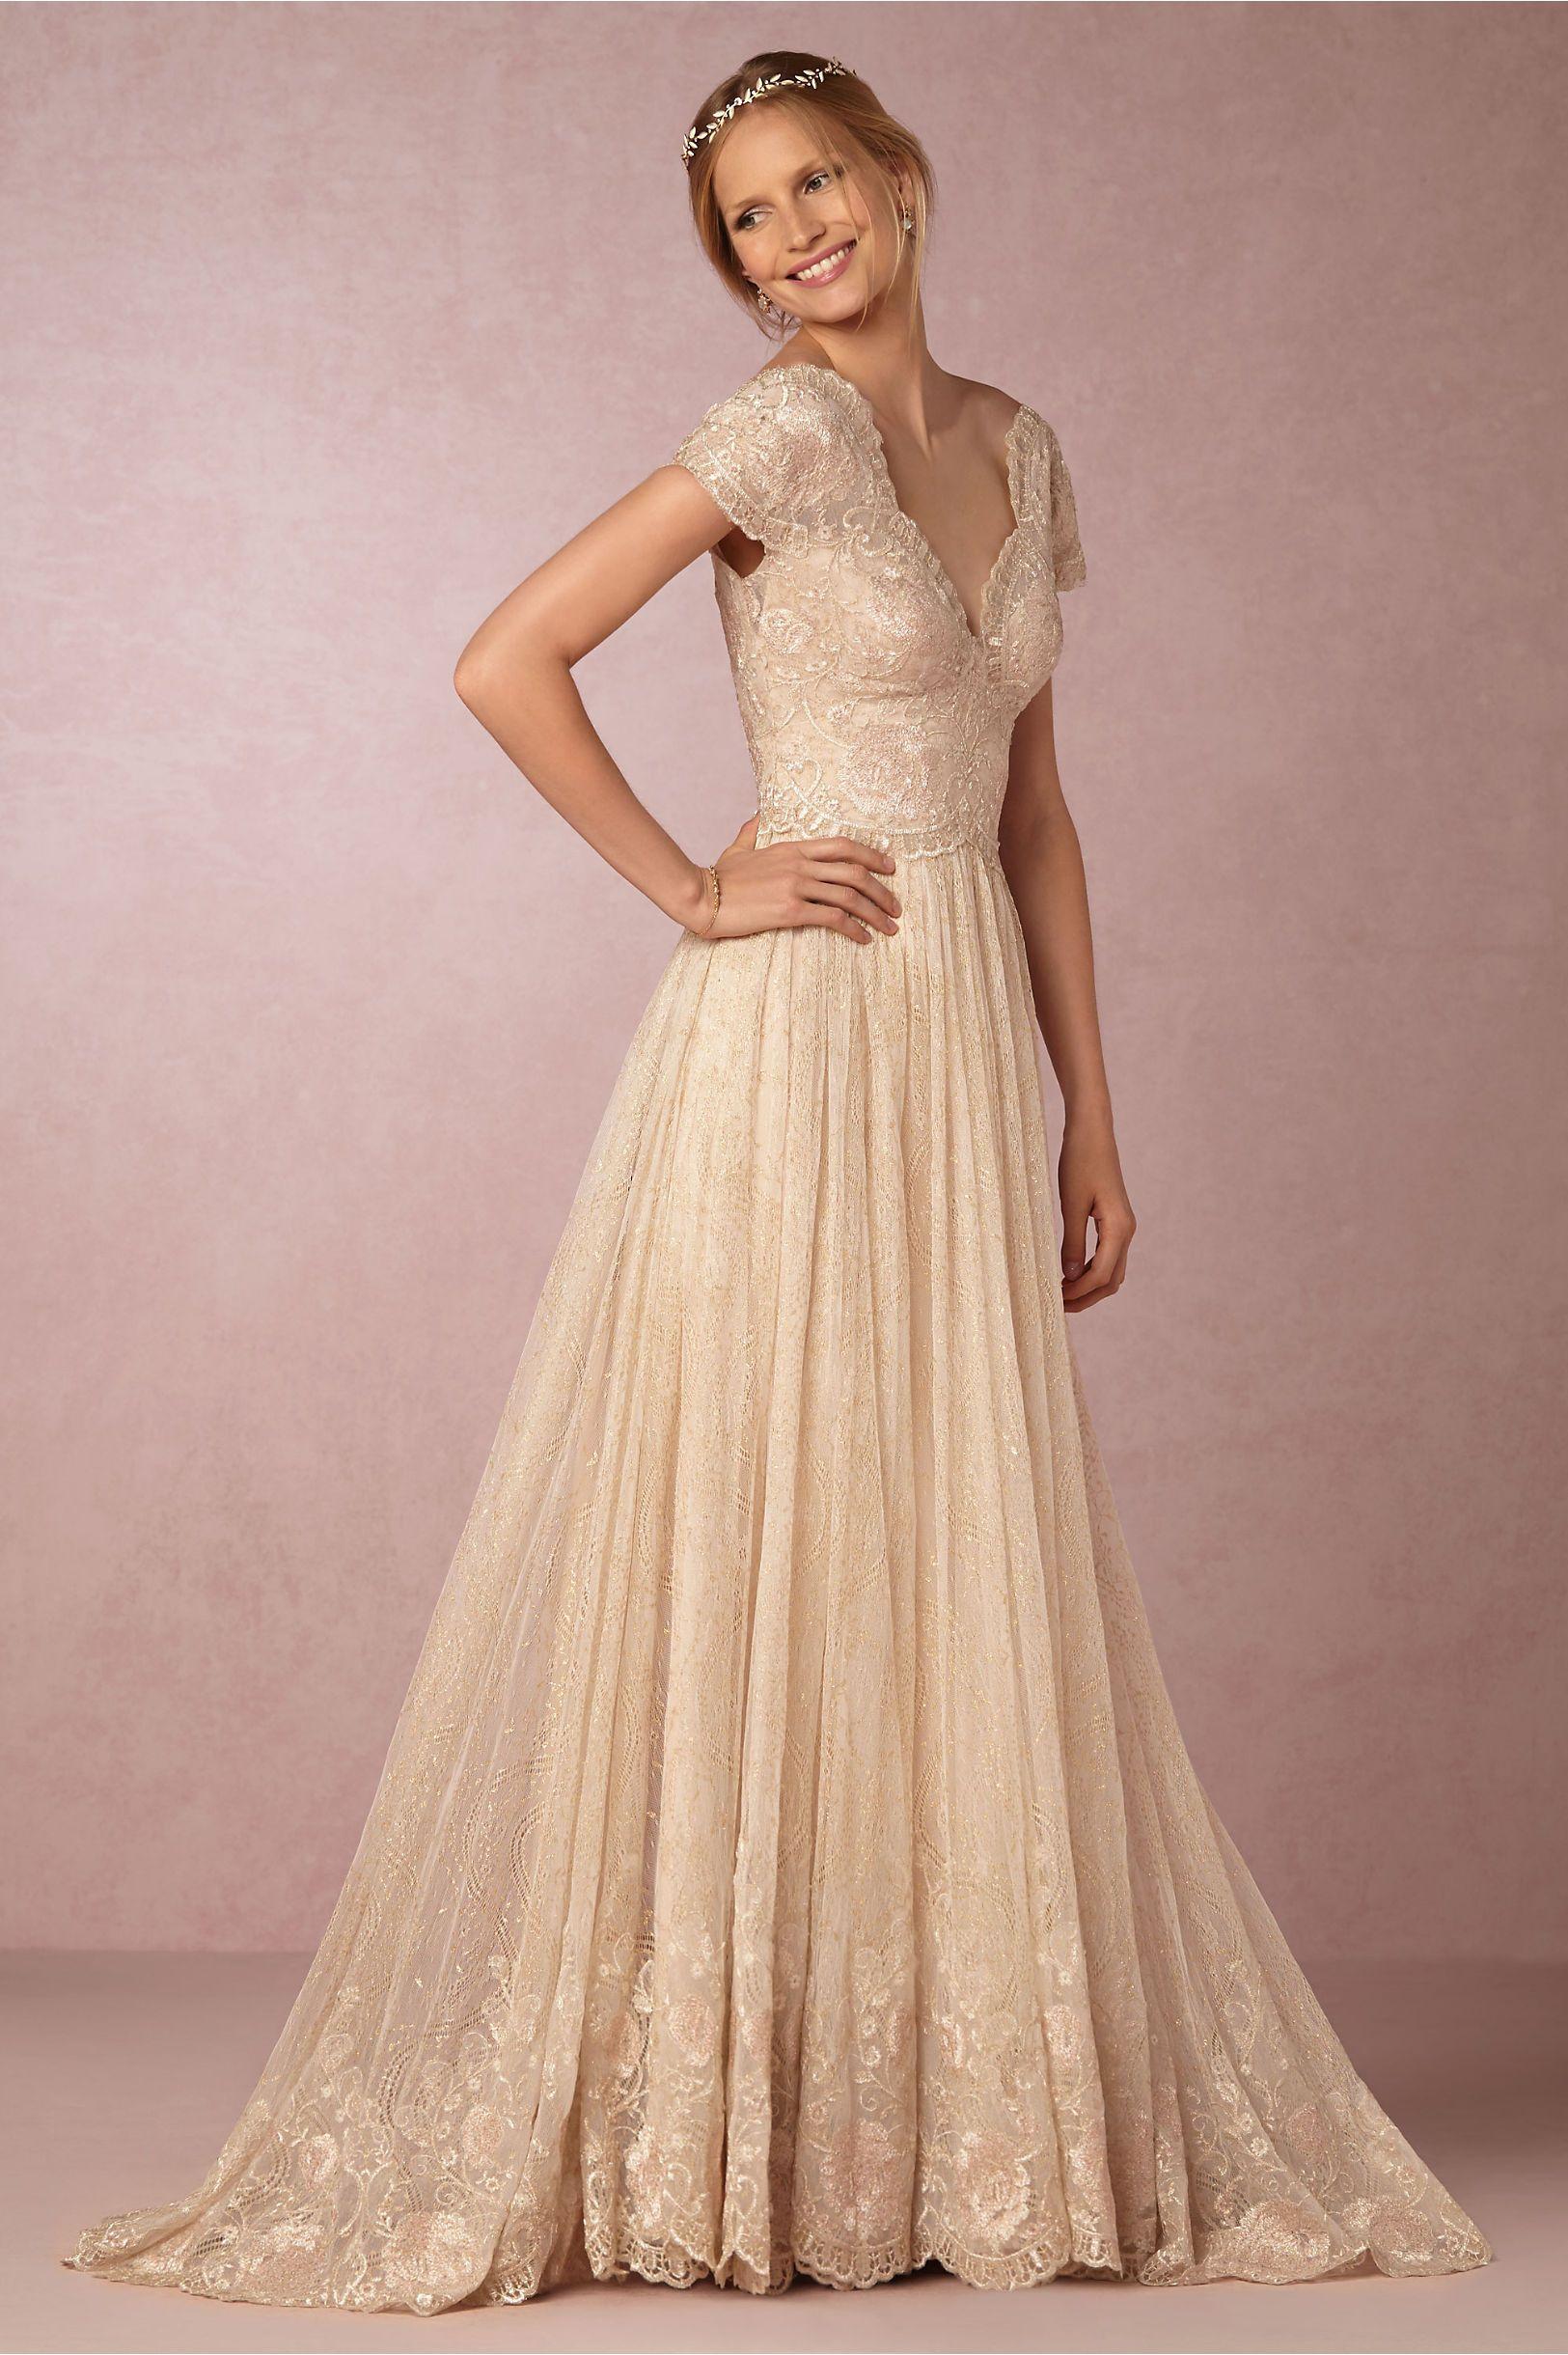 Kensington gown in new at bhldn wedding dress pinterest